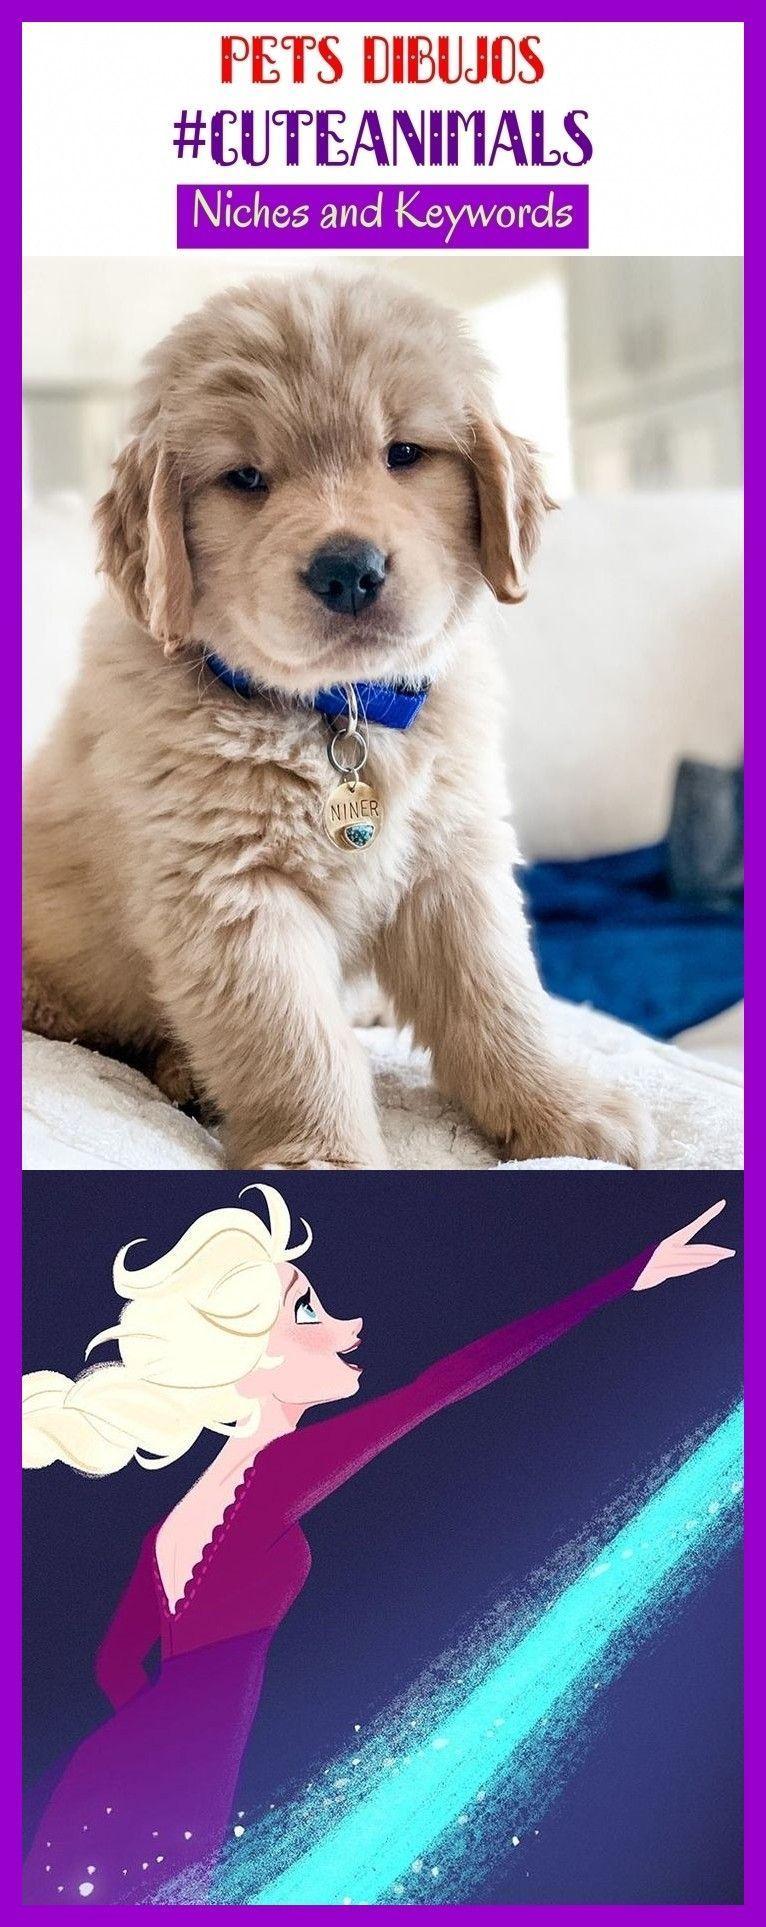 Pets dibujos #cuteanimals #niches #seo #keywords #animals. pets dogs, pets cats,... -  - #animals #Cats #cuteanimals #dibujos #Dogs #keyword #keywords #niches #Pets #seo